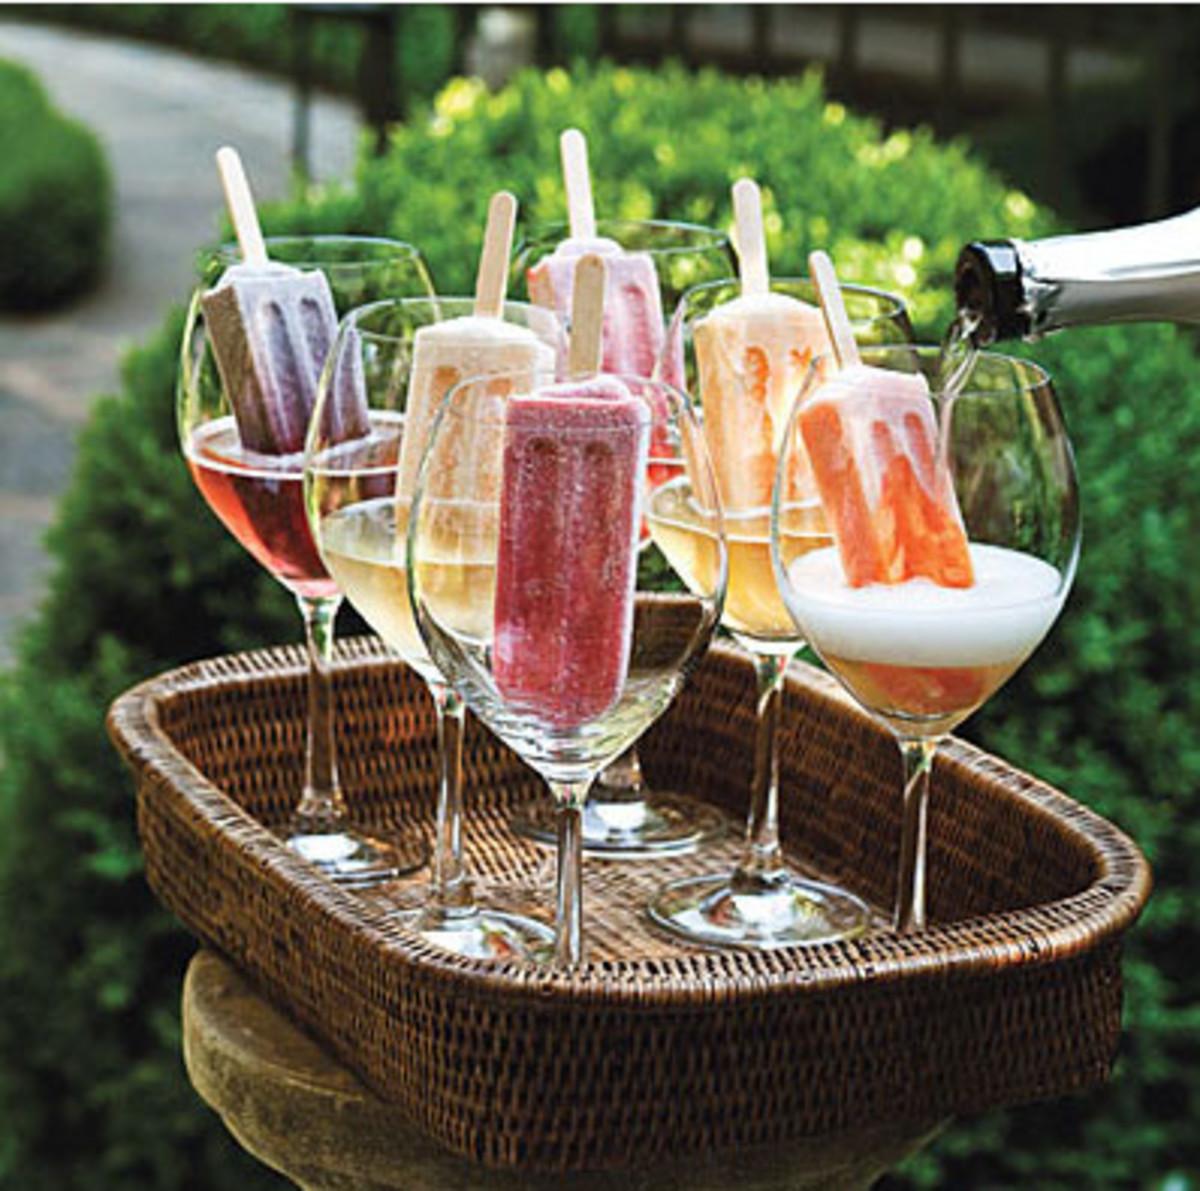 how-to-make-alcoholic-popsicle-recipes-alcohol-margaritas-cocktails-liquor